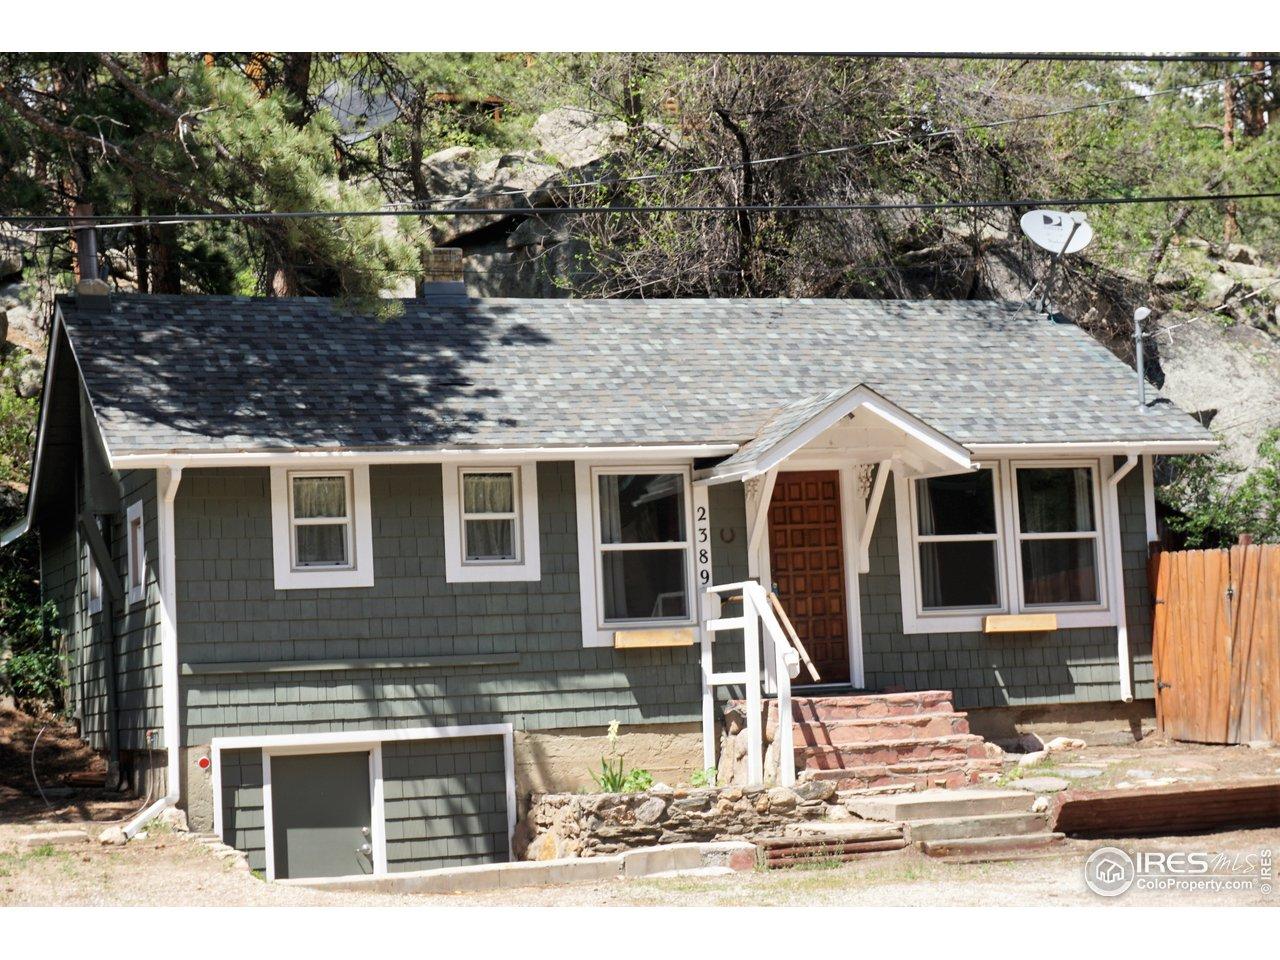 2389 Us Highway 34, Drake, CO 80515, Estes Park - SOLD LISTING, MLS #  884678 | Pink Realty